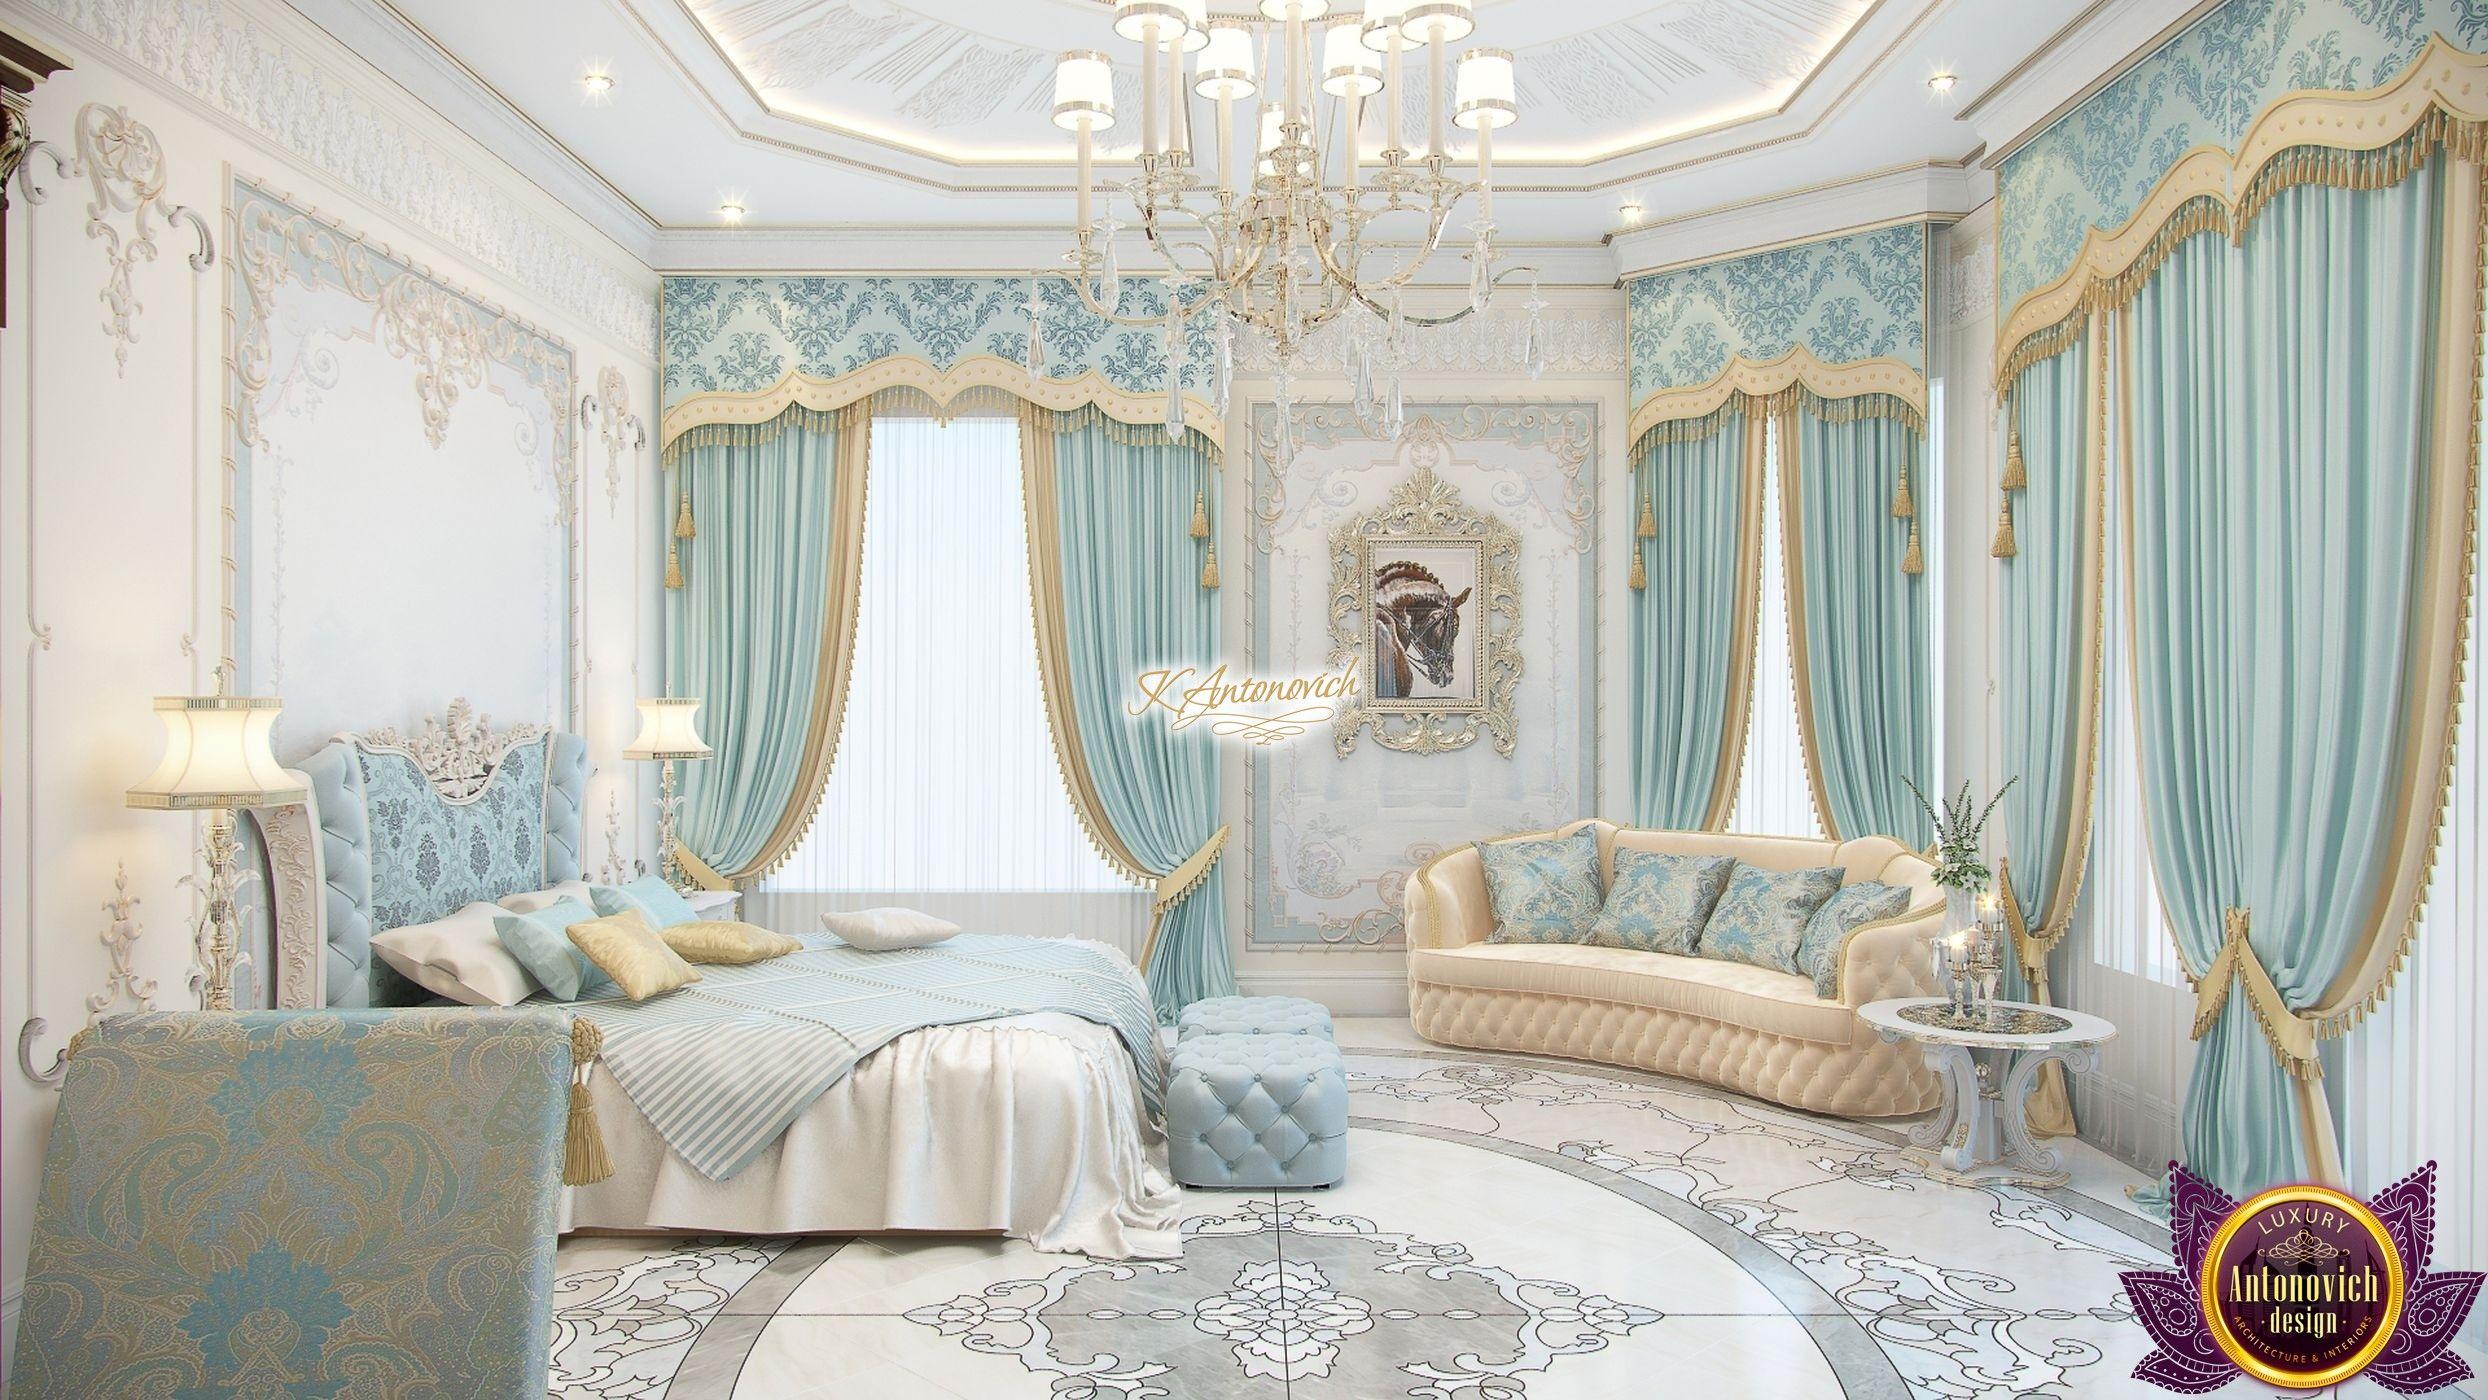 50 cute teenage girl bedroom ideas luxurious bedrooms on home interior design bedroom id=50233